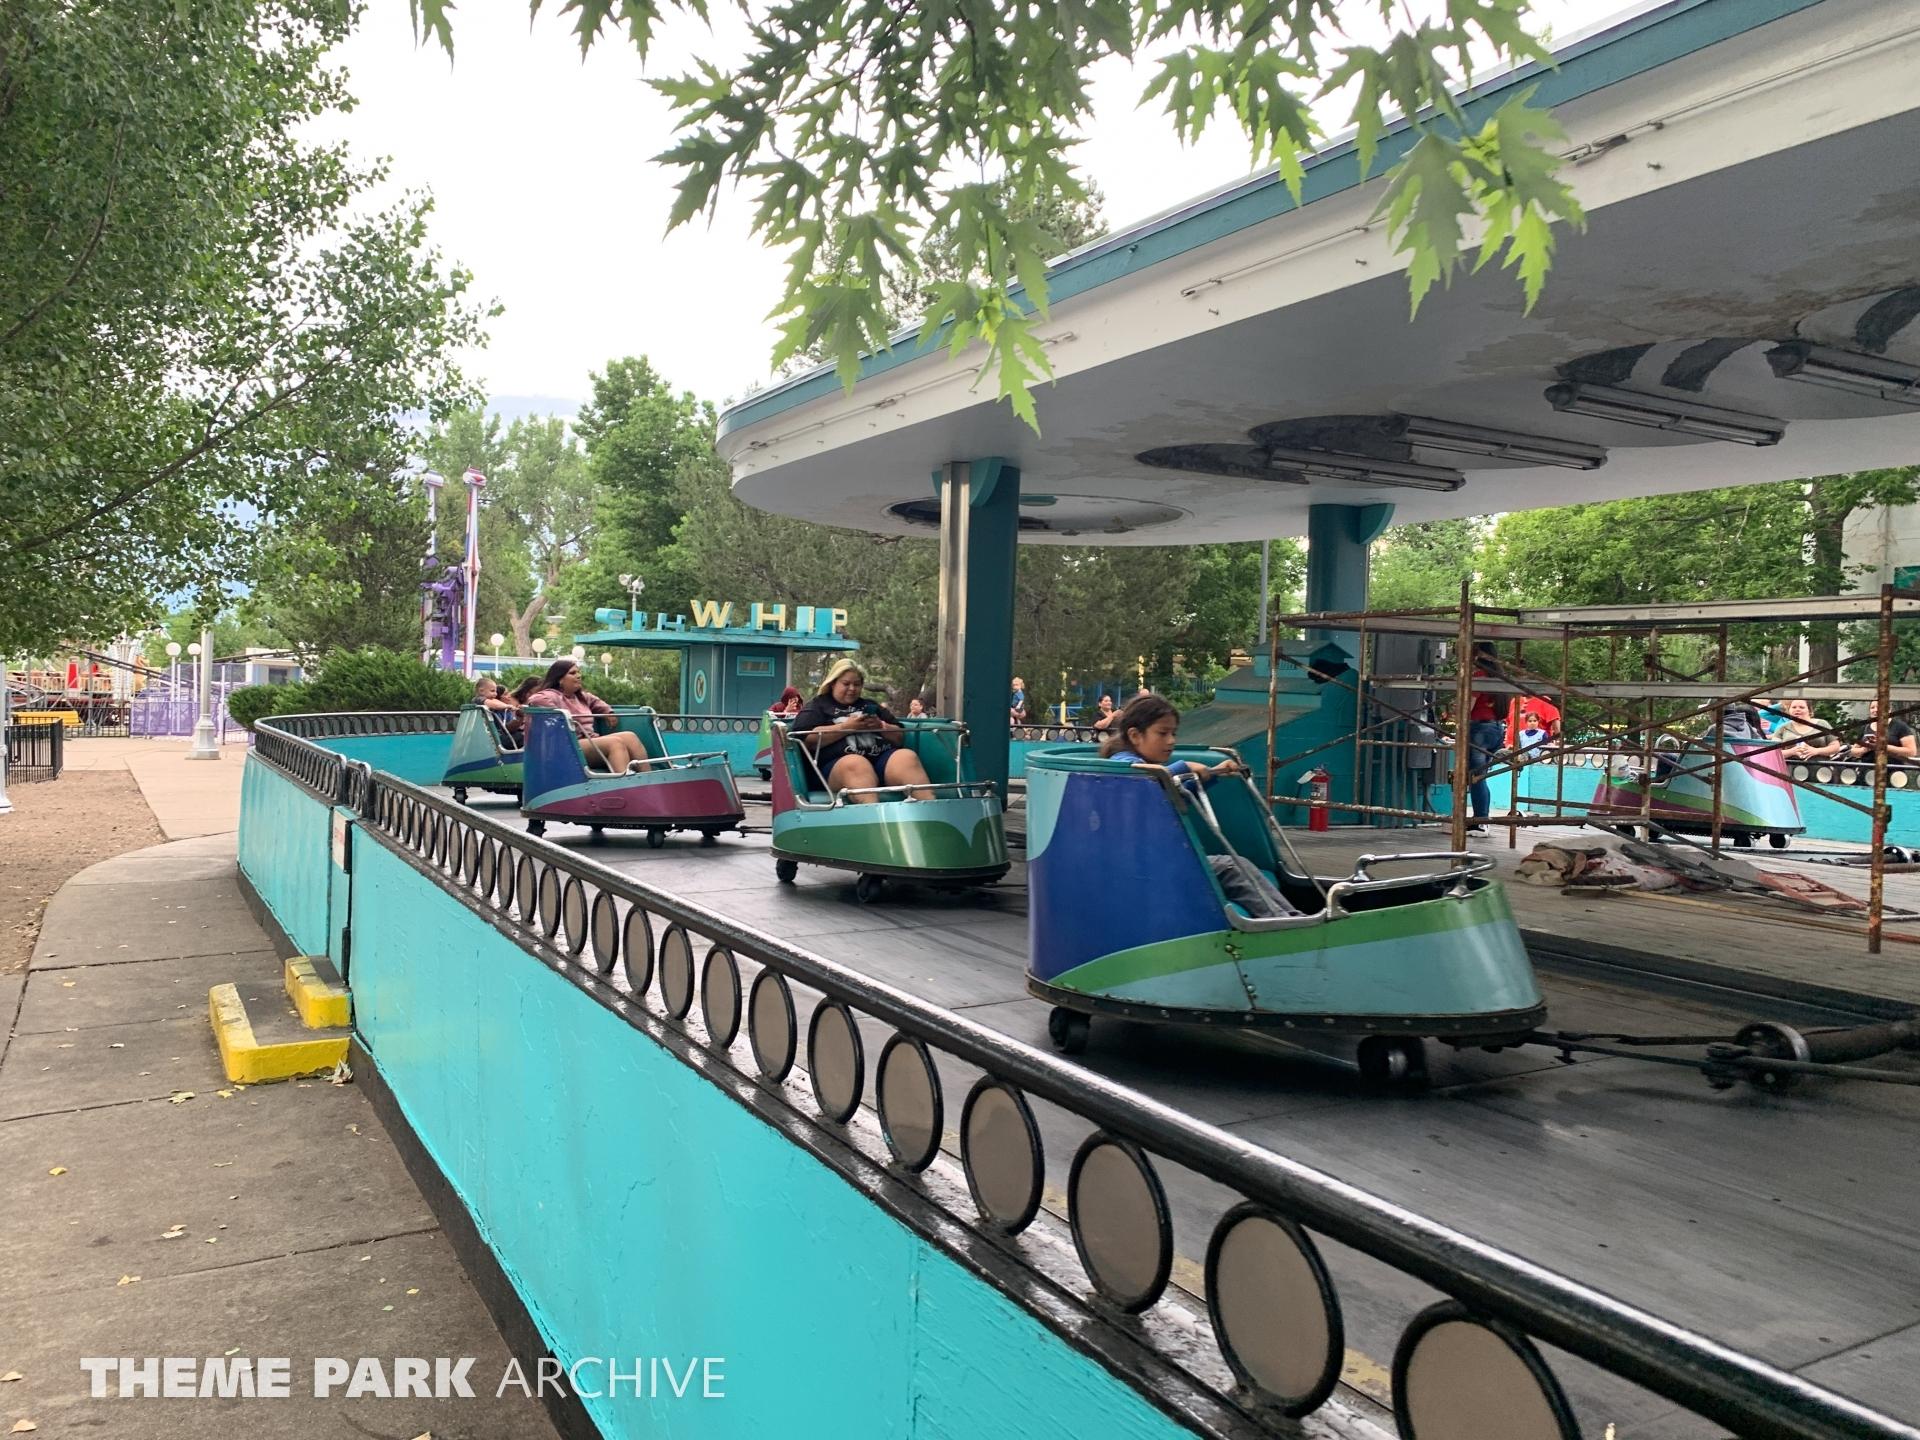 Whip at Lakeside Amusement Park